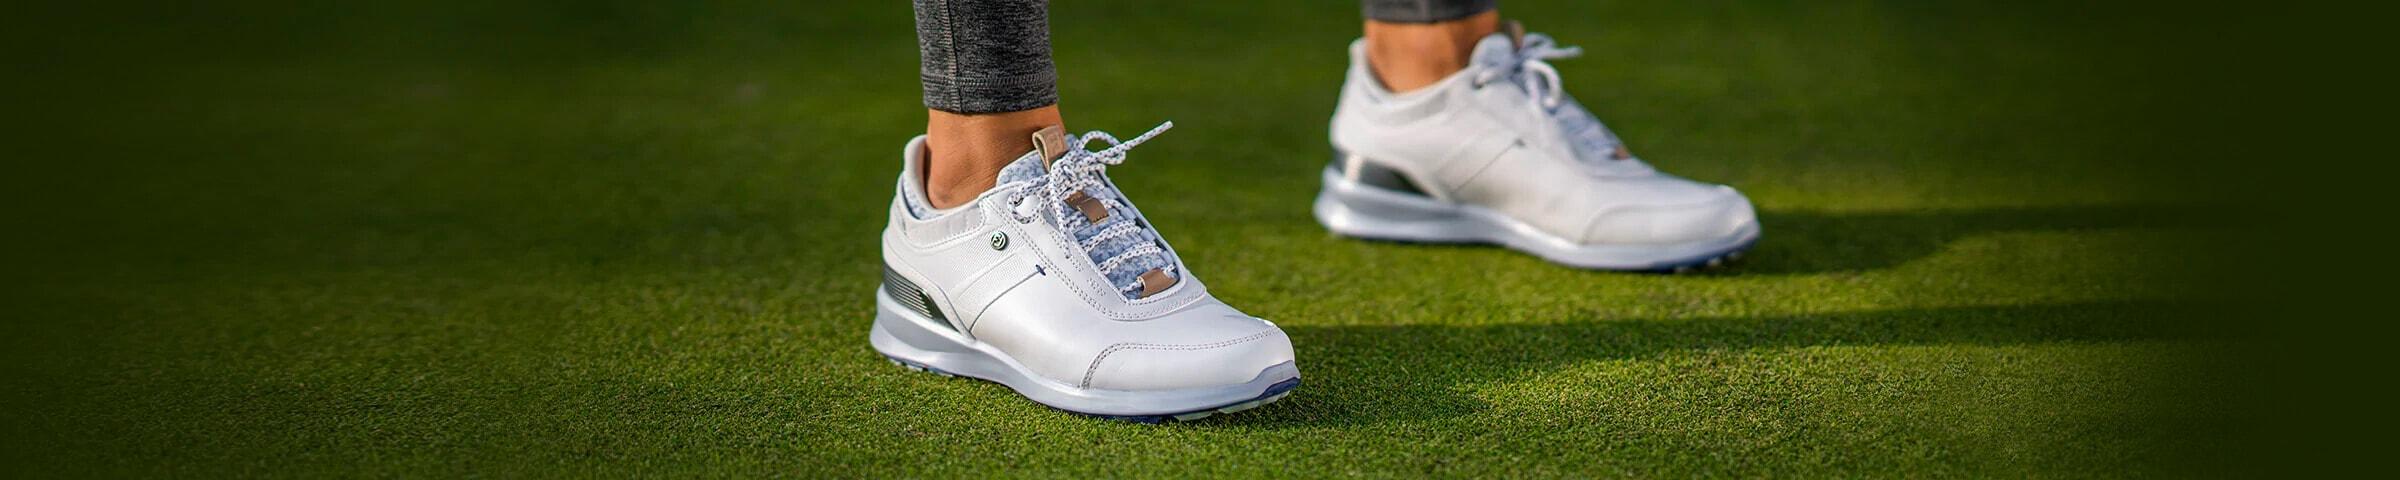 FootJoy Women's Spikeless Shoes